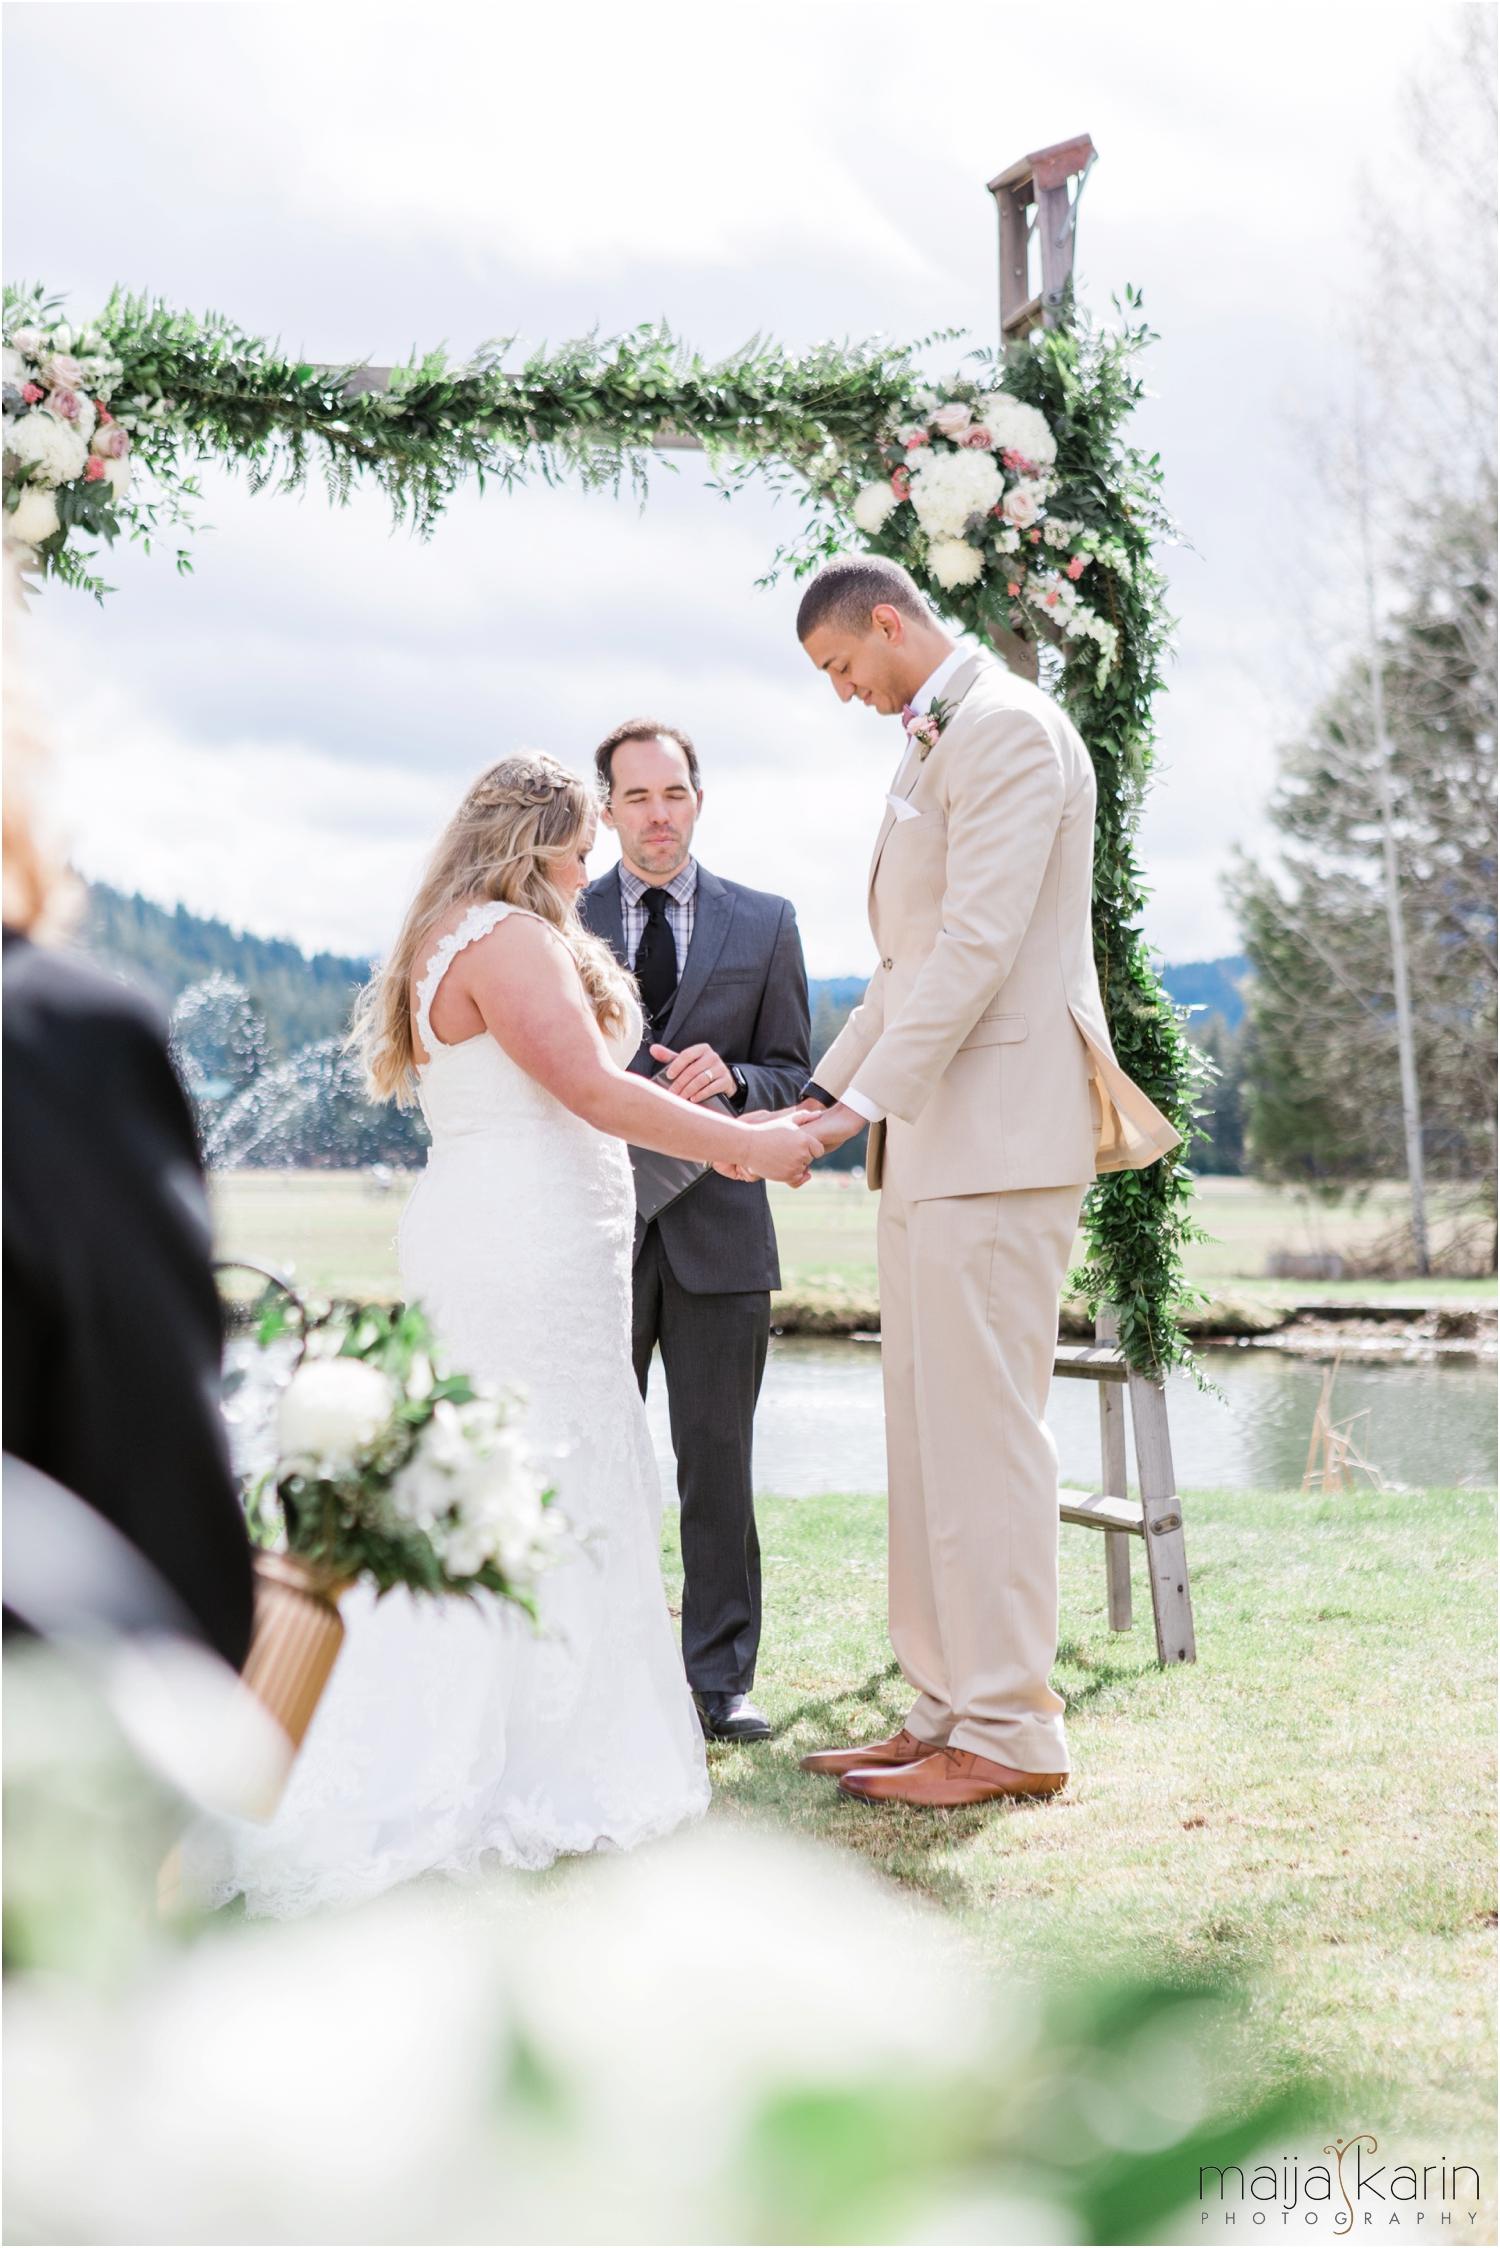 Mountain Springs Lodge wedding Maija Karin Photography%0DMaija Karin Photography%0DMaija Karin Photography%0DMountain-Springs-Lodge-Wedding-Maija-Karin-Photography_0041.jpg